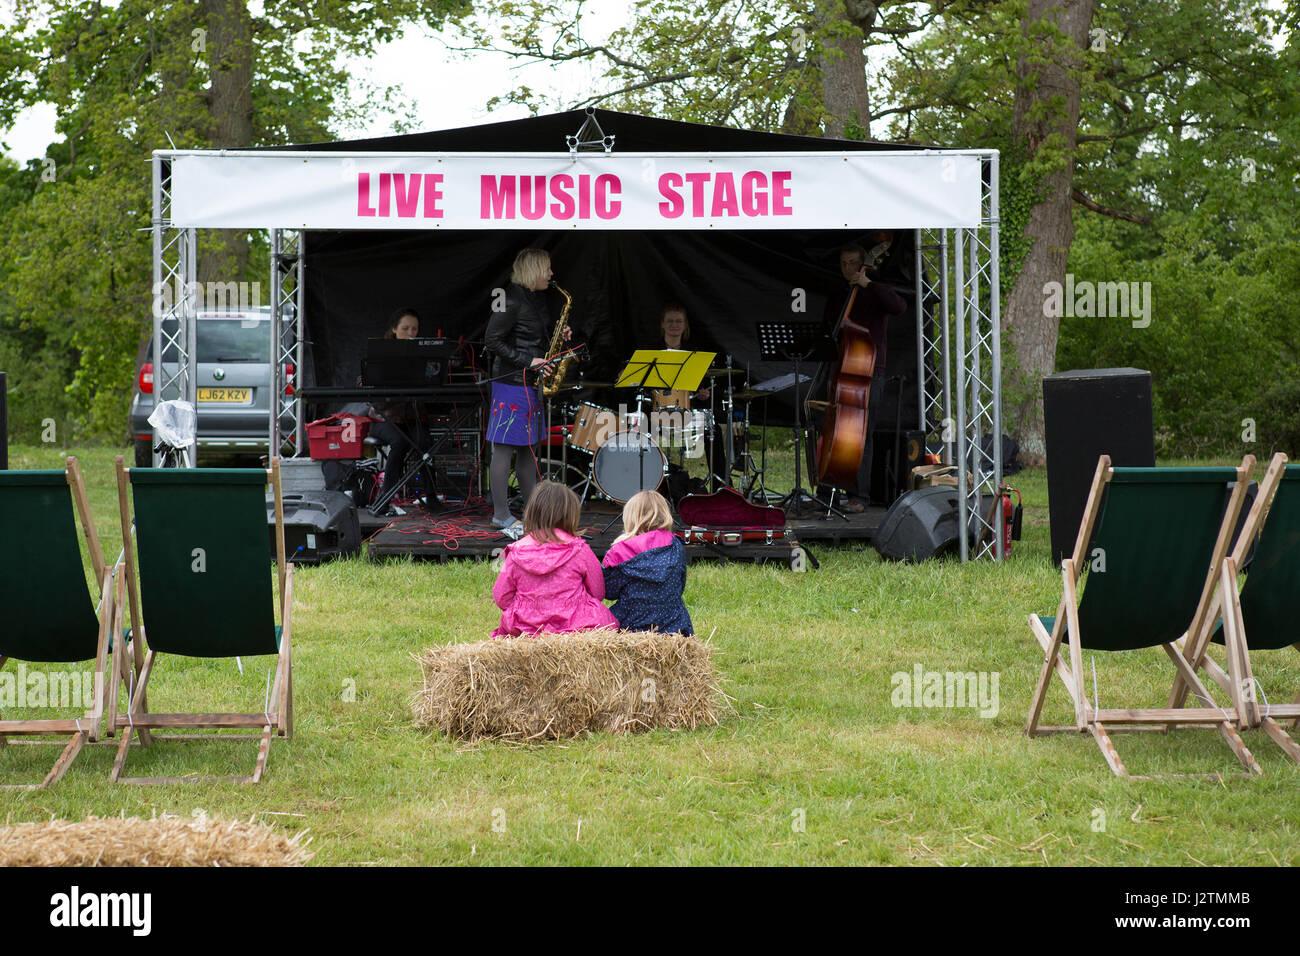 Mapledurham, Oxfordshire, UK . 1st May, 2017.  two young girls enjoying the  Live Music Stage at Mapledurham food - Stock Image